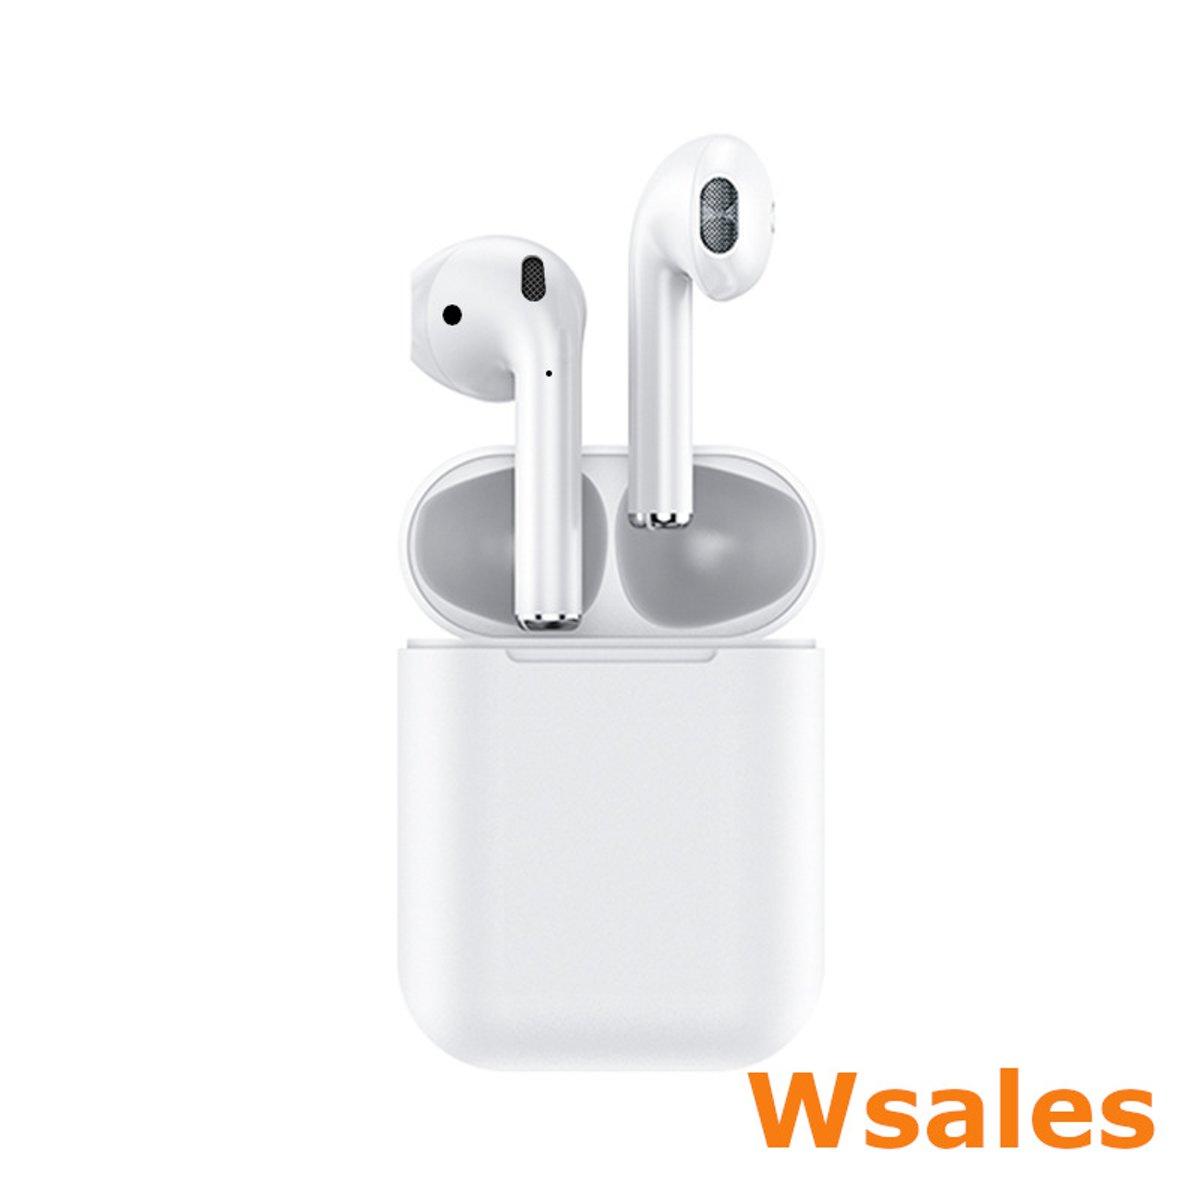 Draadloze Bluetooth oortjes in ear | Draadloze oordopjes in ear | Wit | True Wireless Sound | Alternatief op AirPods | Bluetooth 5.0 | Touch bediening | Stereo geluid | Headset | Individueel te gebruiken | Wsales